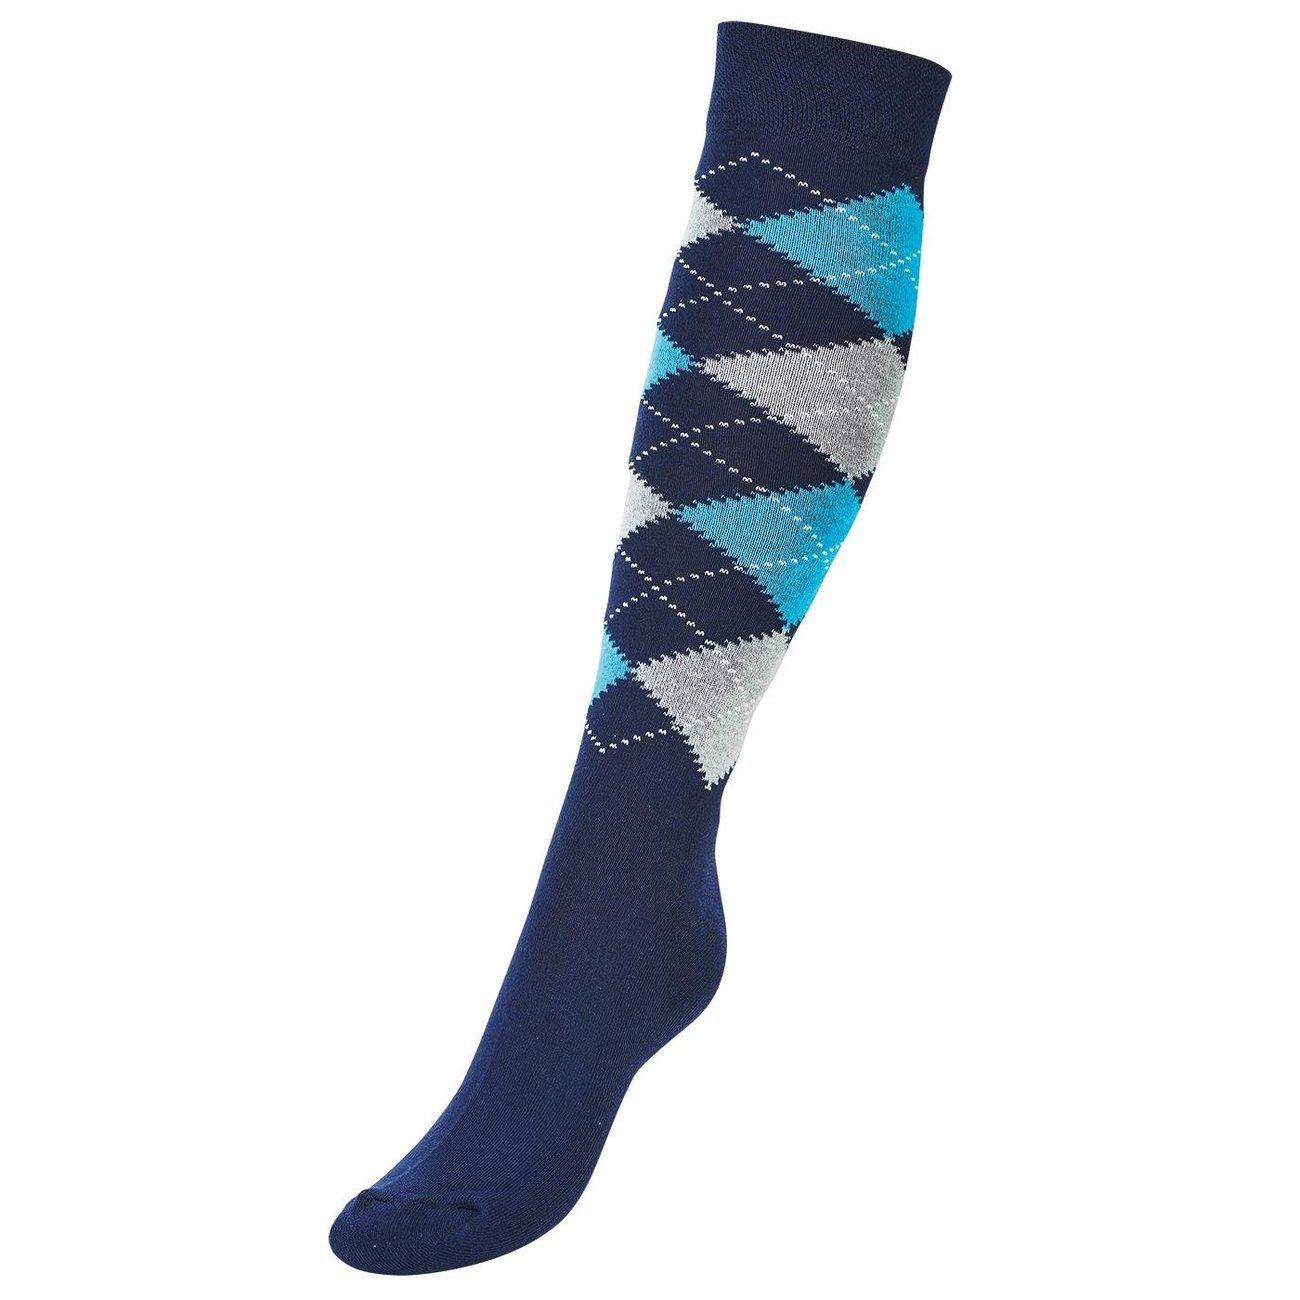 BUSSE Socken Basic Karo III, Gr. 35 - 38, navy/denim/grey